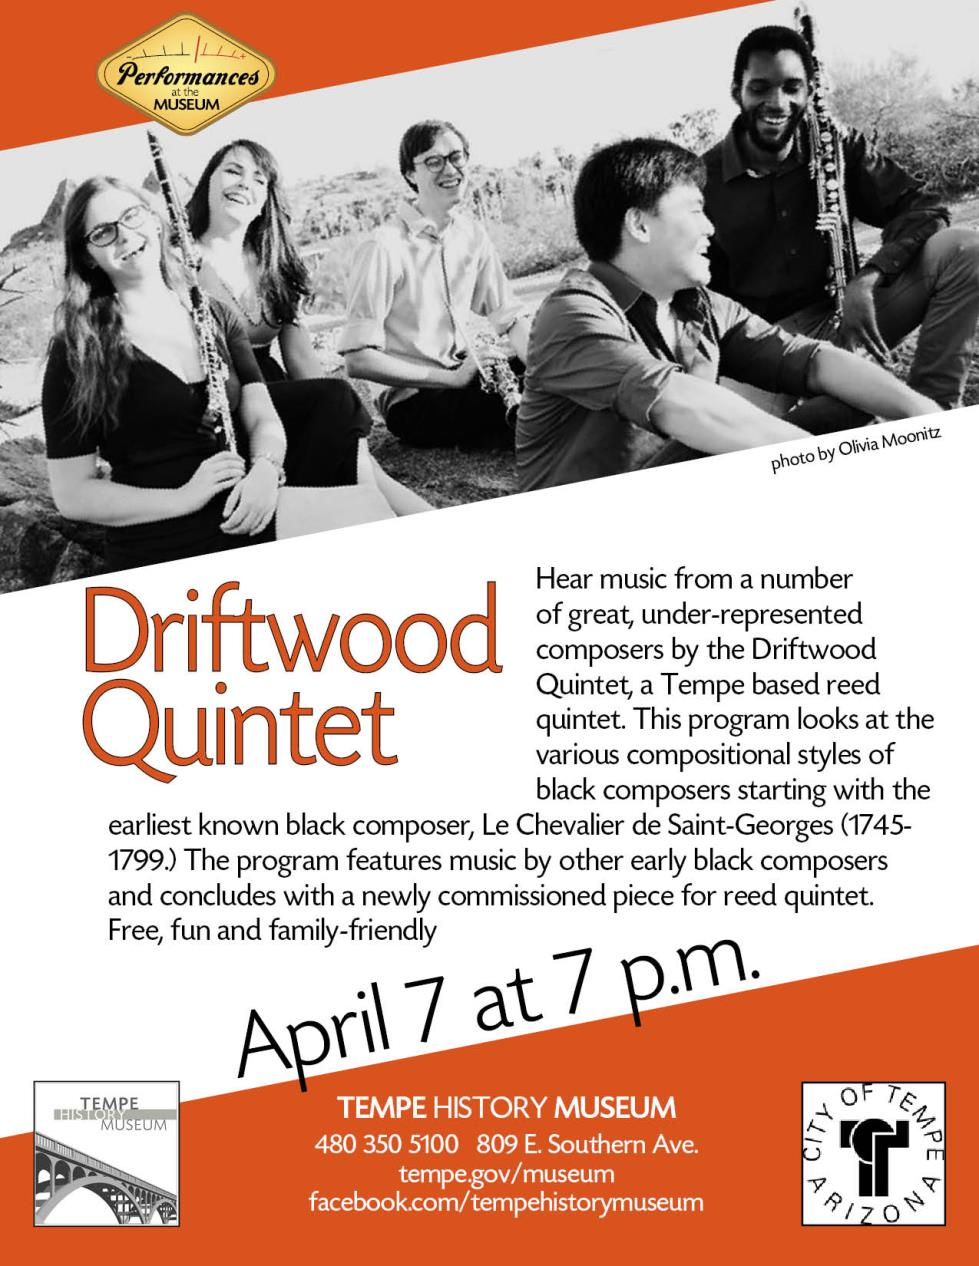 PERFORMANCES at the MUSEUM: Driftwood Quintet | Calendar of